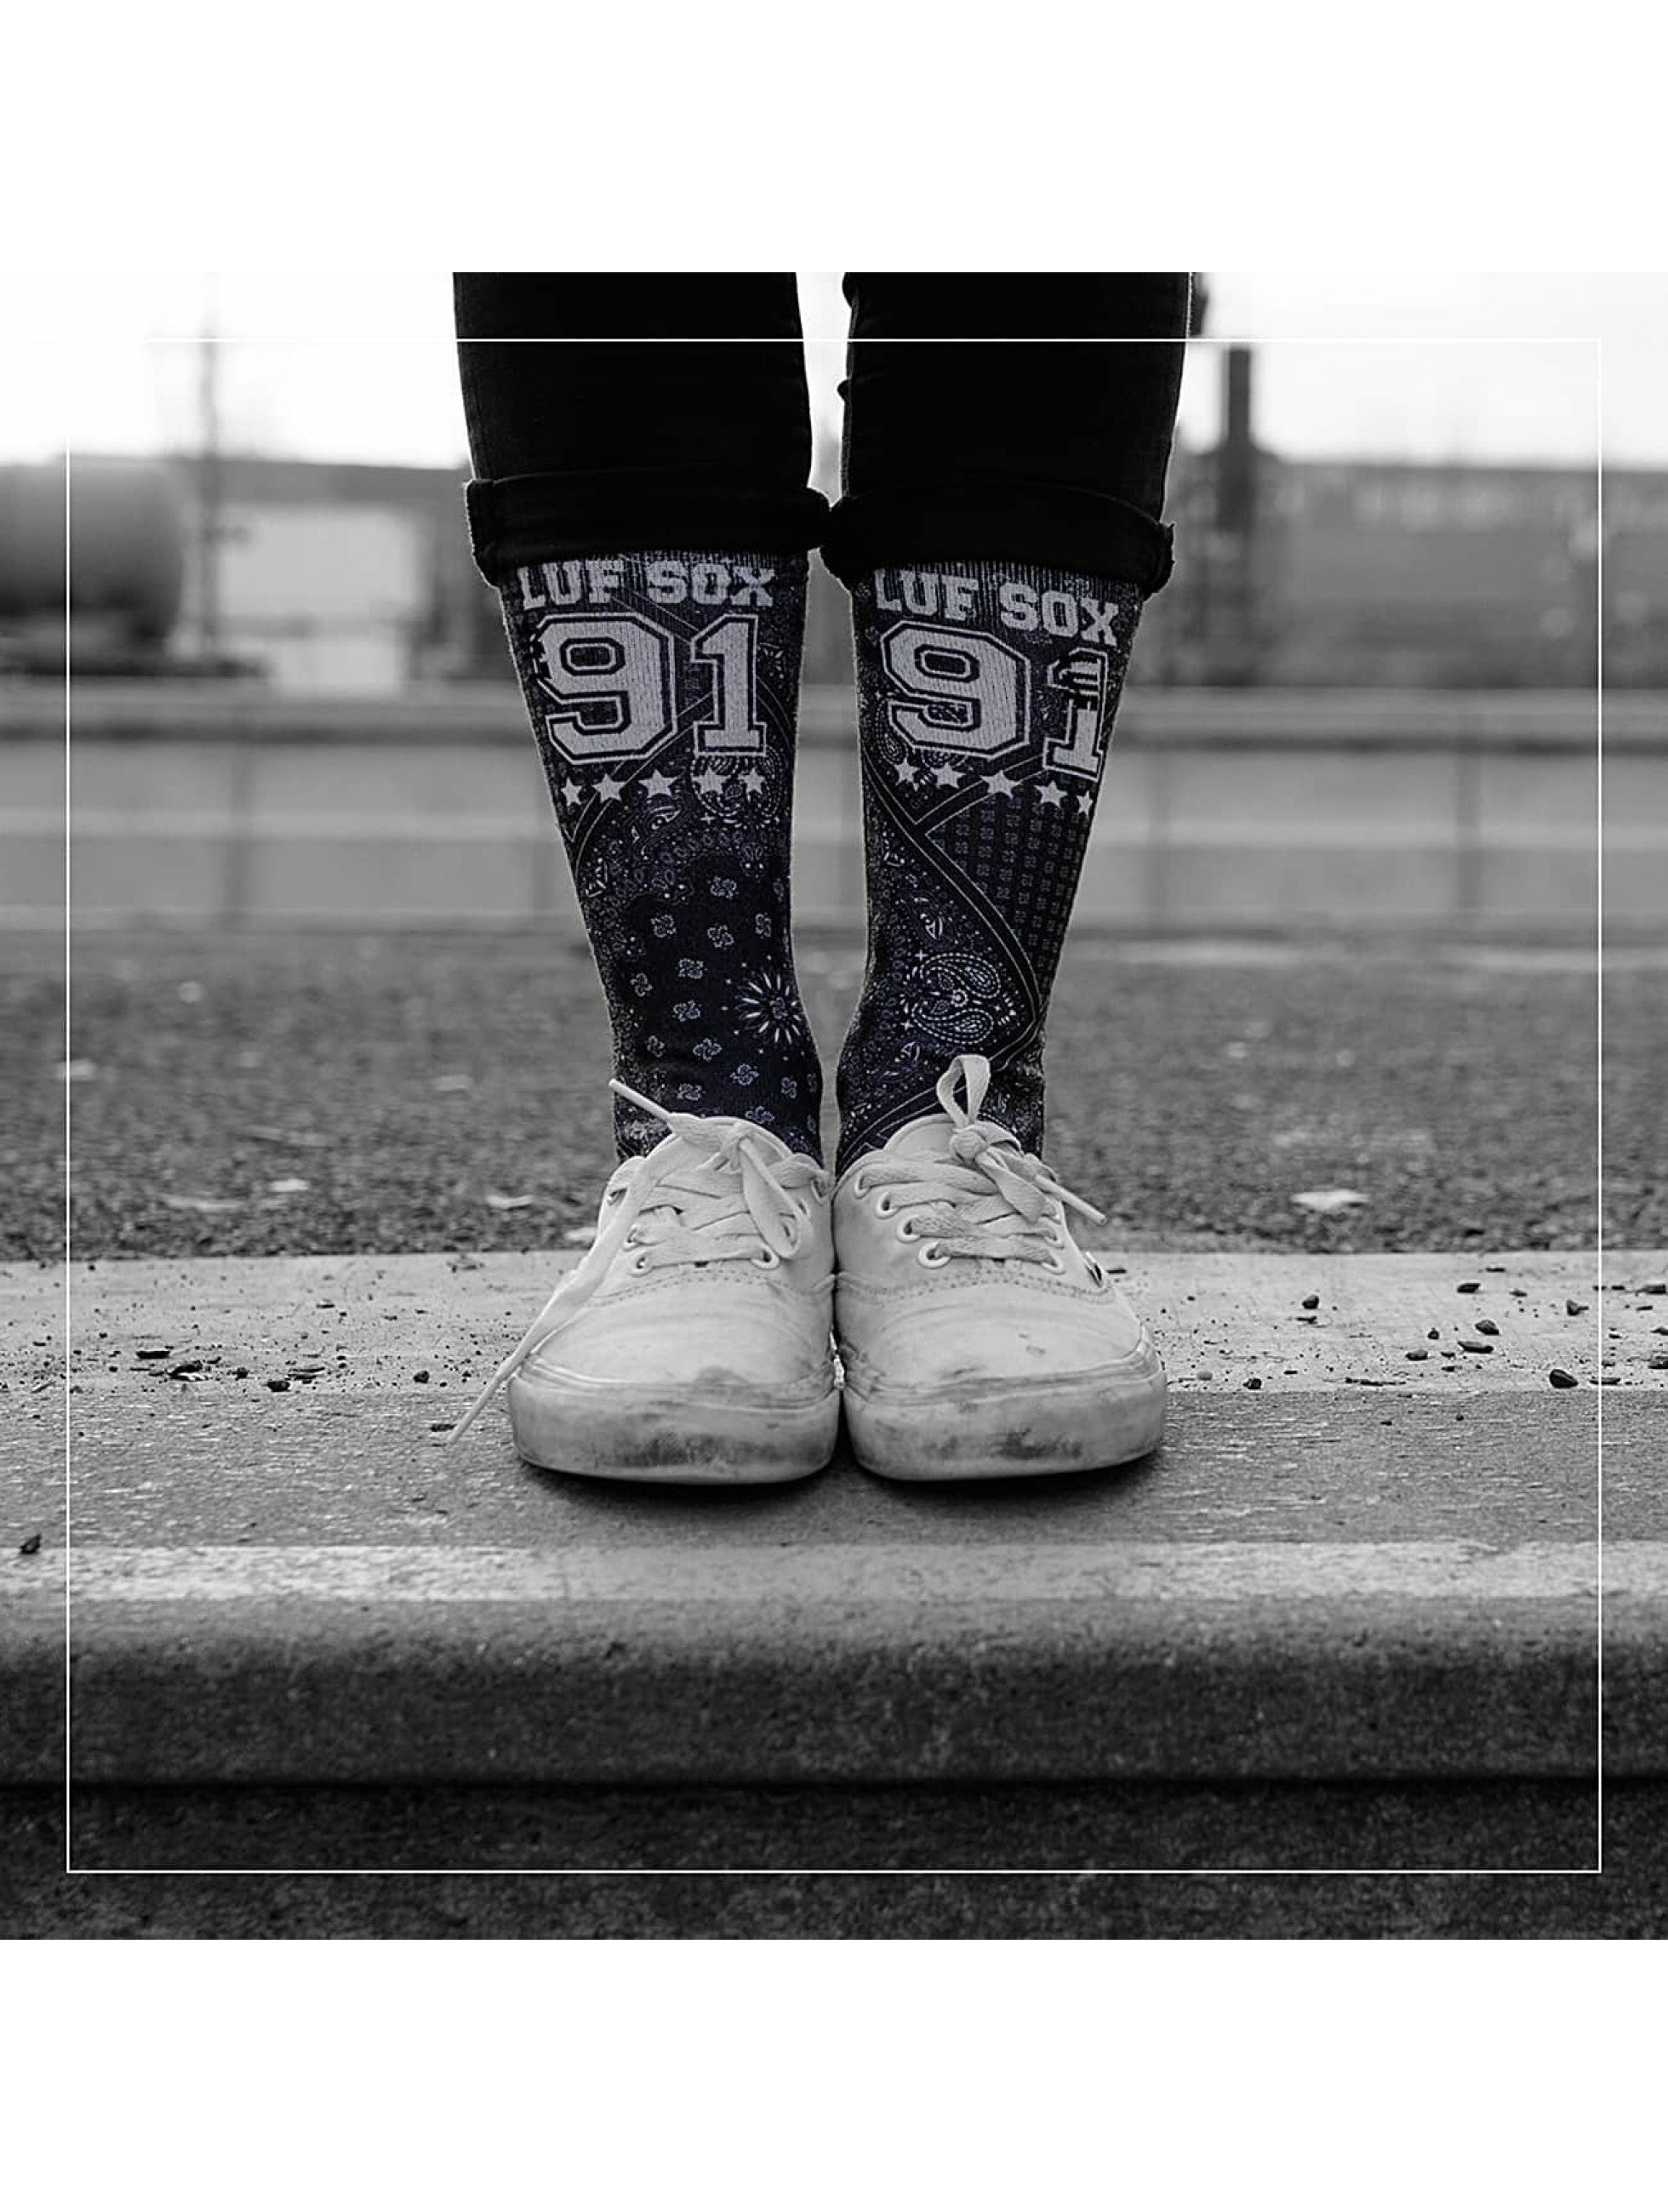 LUF SOX Socken Bandana schwarz